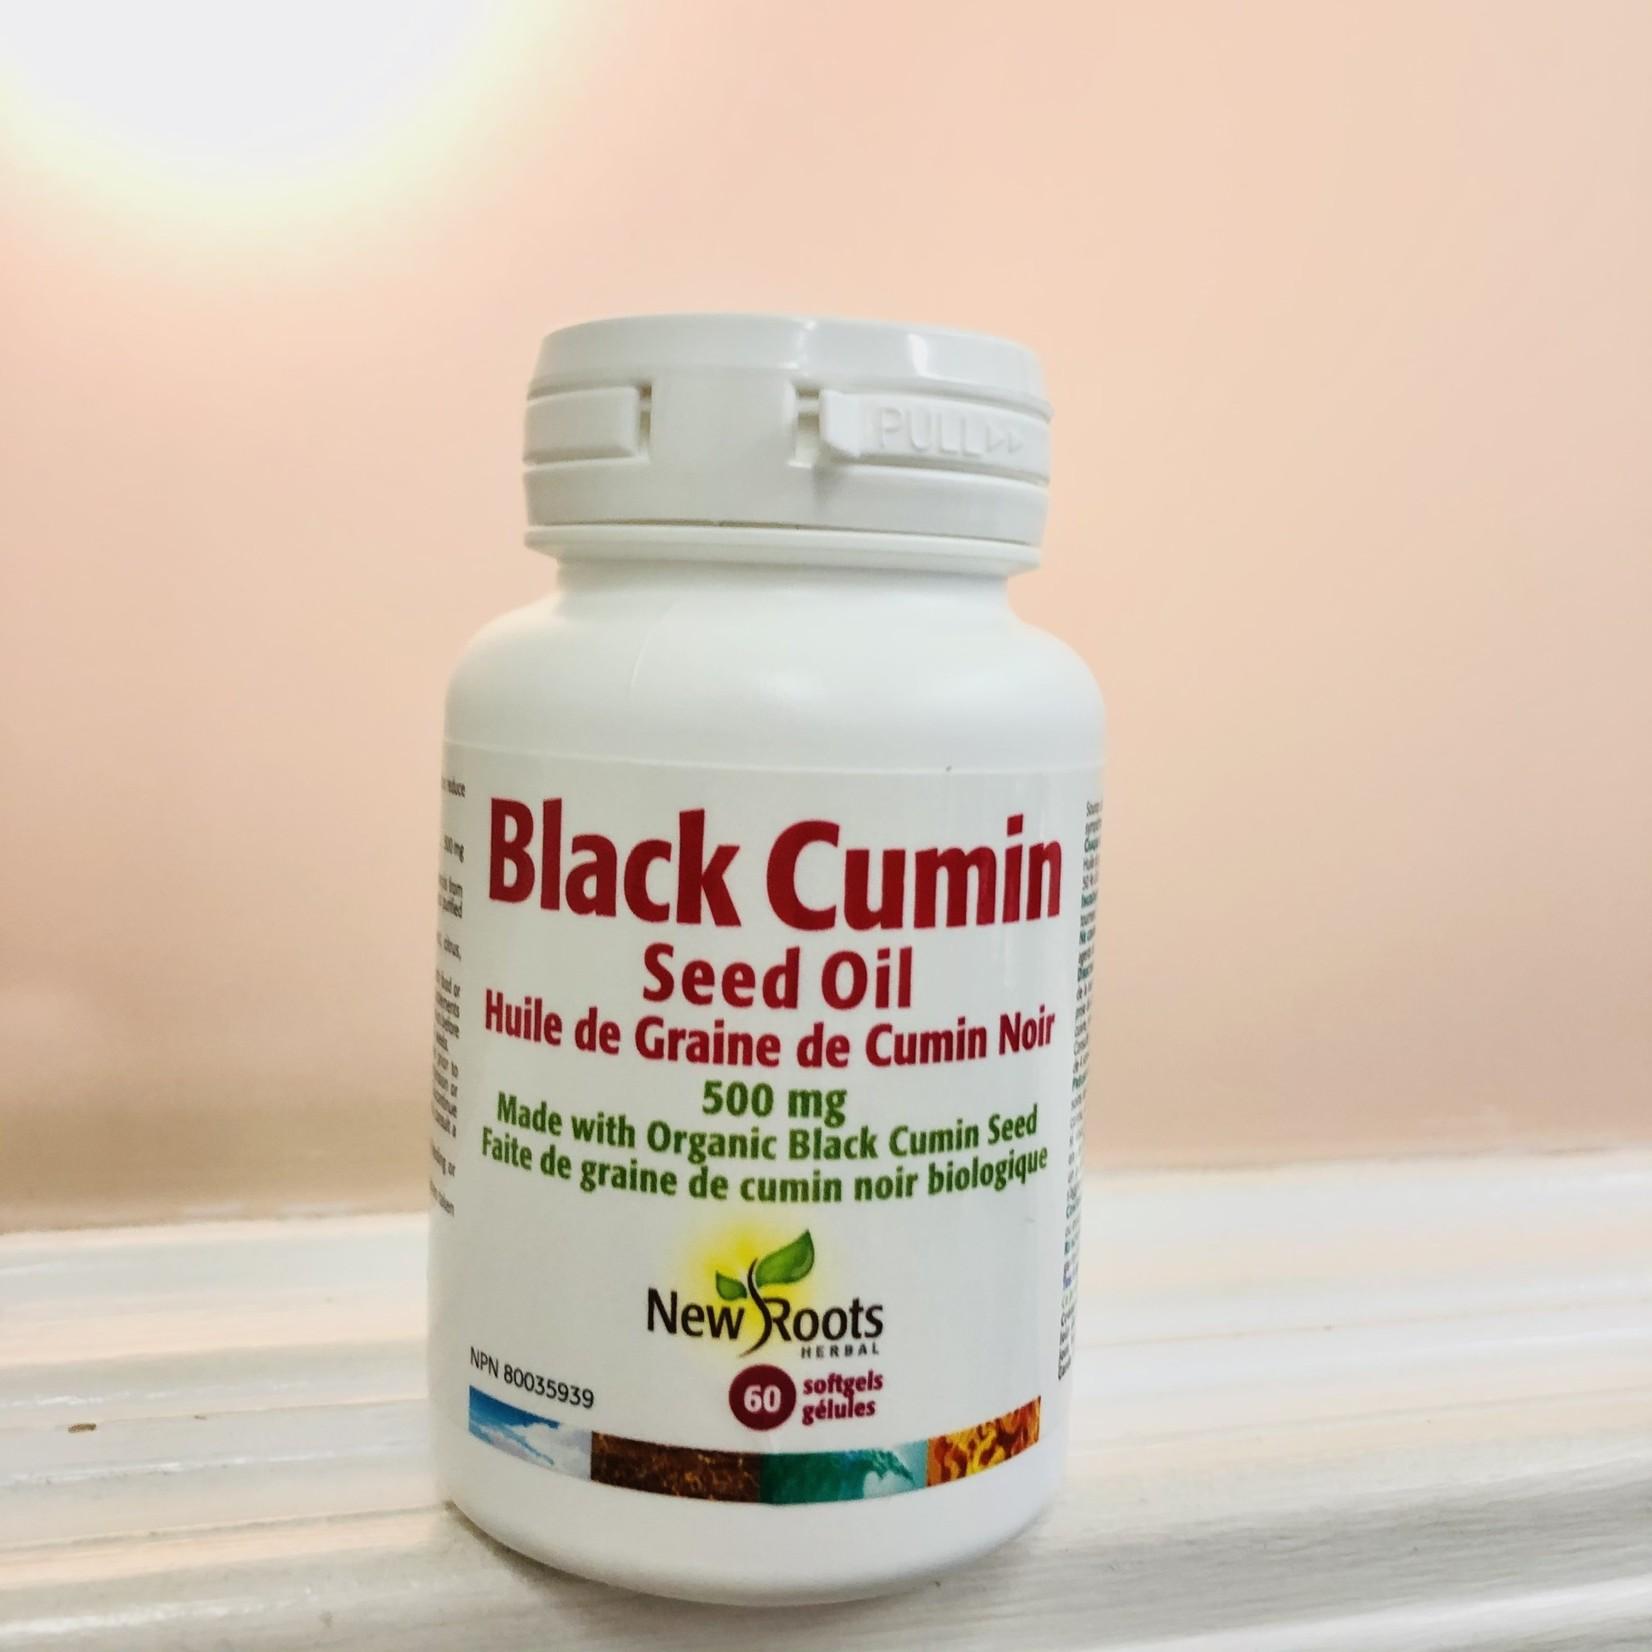 New Roots New Roots Black Cumin Seed Oil 60 softgels